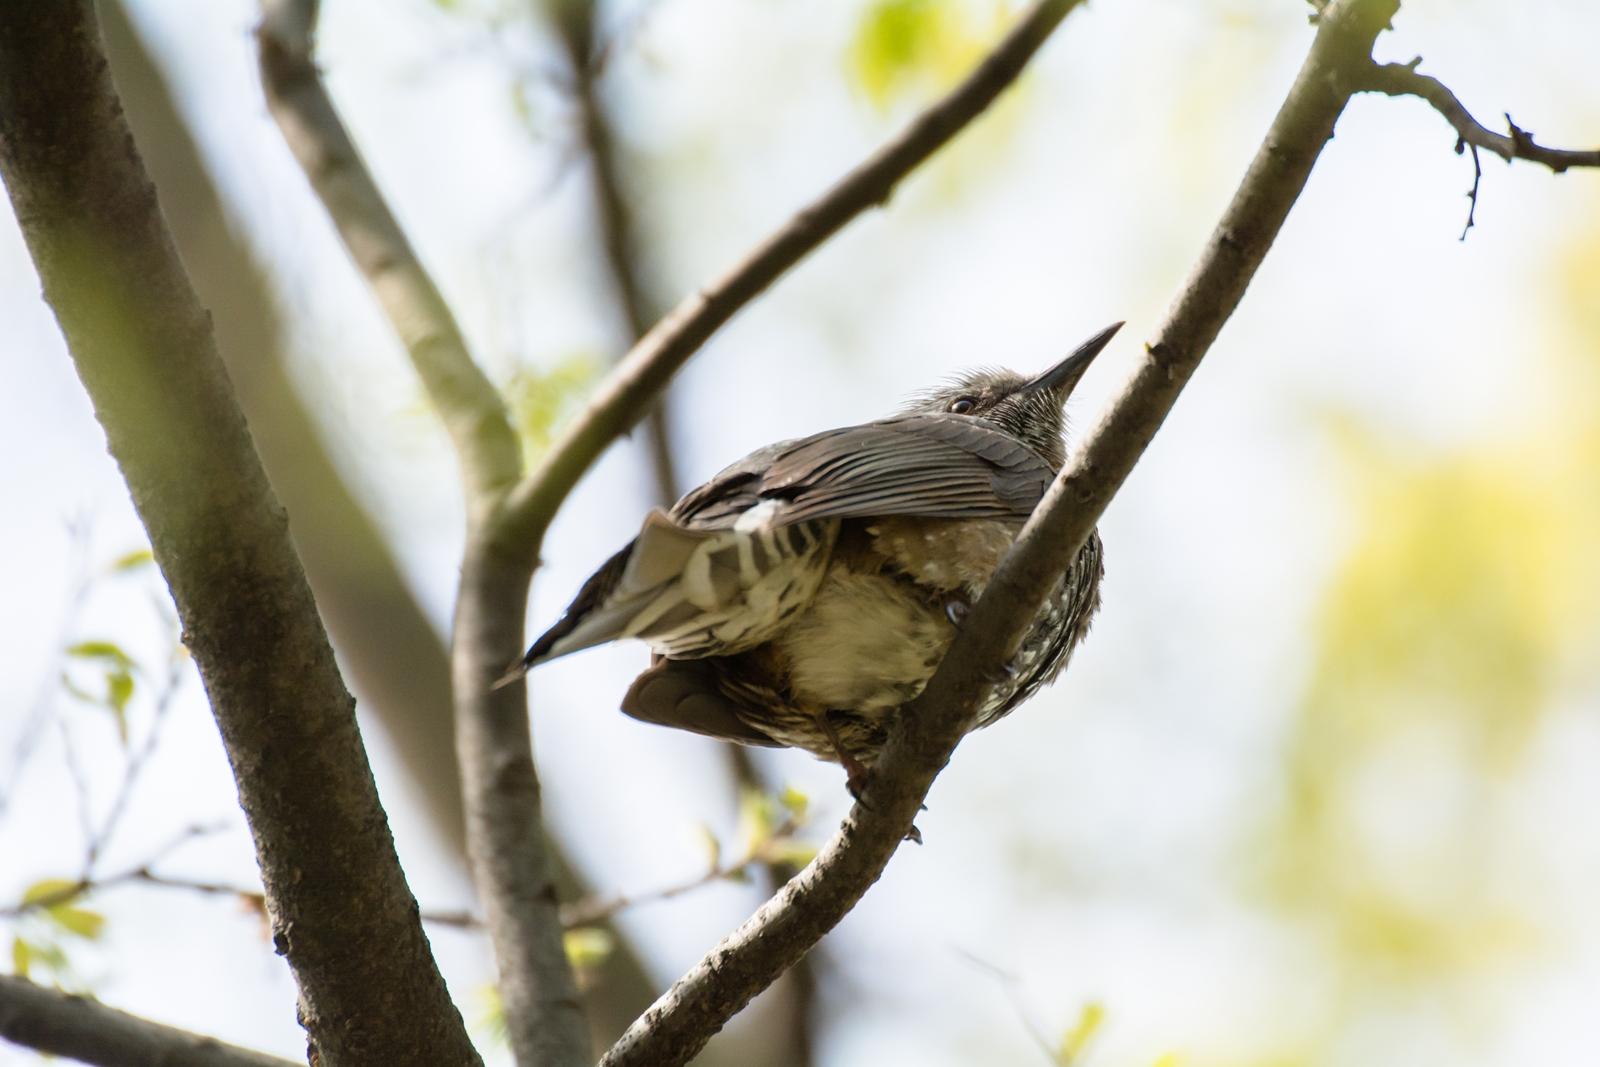 Photo: 緑輝く Shines green.  柔らかな緑たちに 陽の恵みがそそぐ 活き活きと輝き ざわわざわわと騒ぎ出す  Brown-eared Bulbul. (ヒヨドリ)  #cooljapan #365cooljapanmay  #birdphotography #birds  #kawaii  Nikon D7100 SIGMA APO 50-500mm F5-6.3 DG OS HSM [ Day352, April 29th ]  小鳥の詩朗読 https://youtu.be/v_O7DQzLkHk?list=PL2YtHGm0-R3qVsaqvQe9OYdJFCkI98wzF